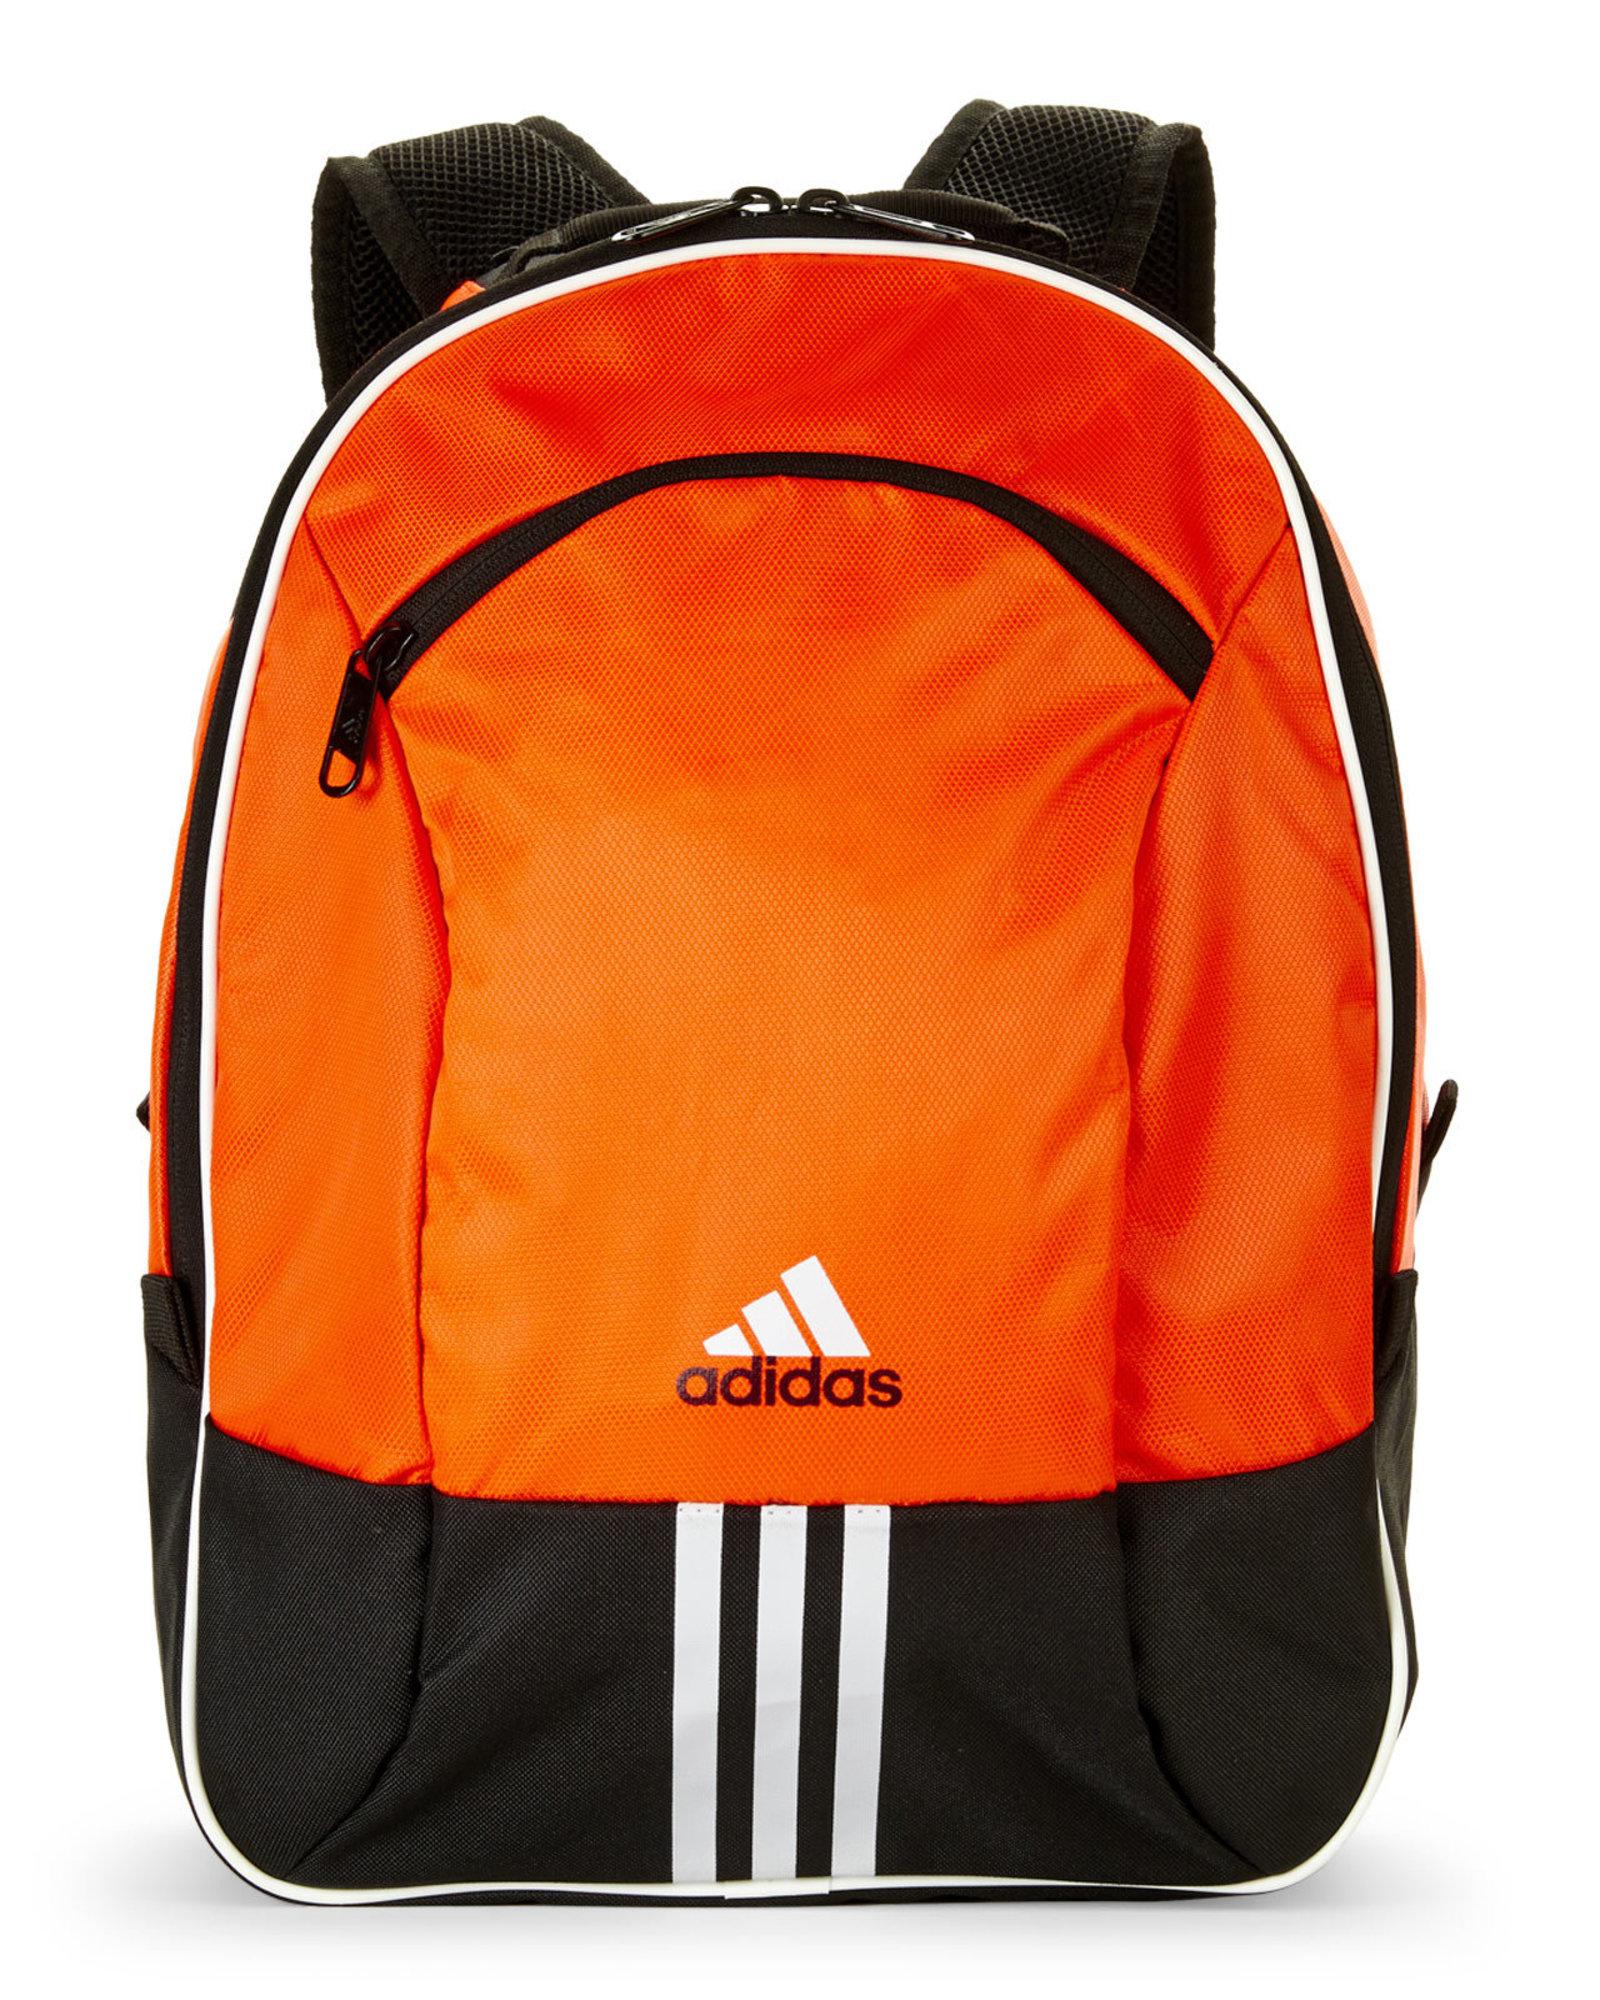 Lyst - adidas Originals Neon Orange   Black Pincer Backpack in ...